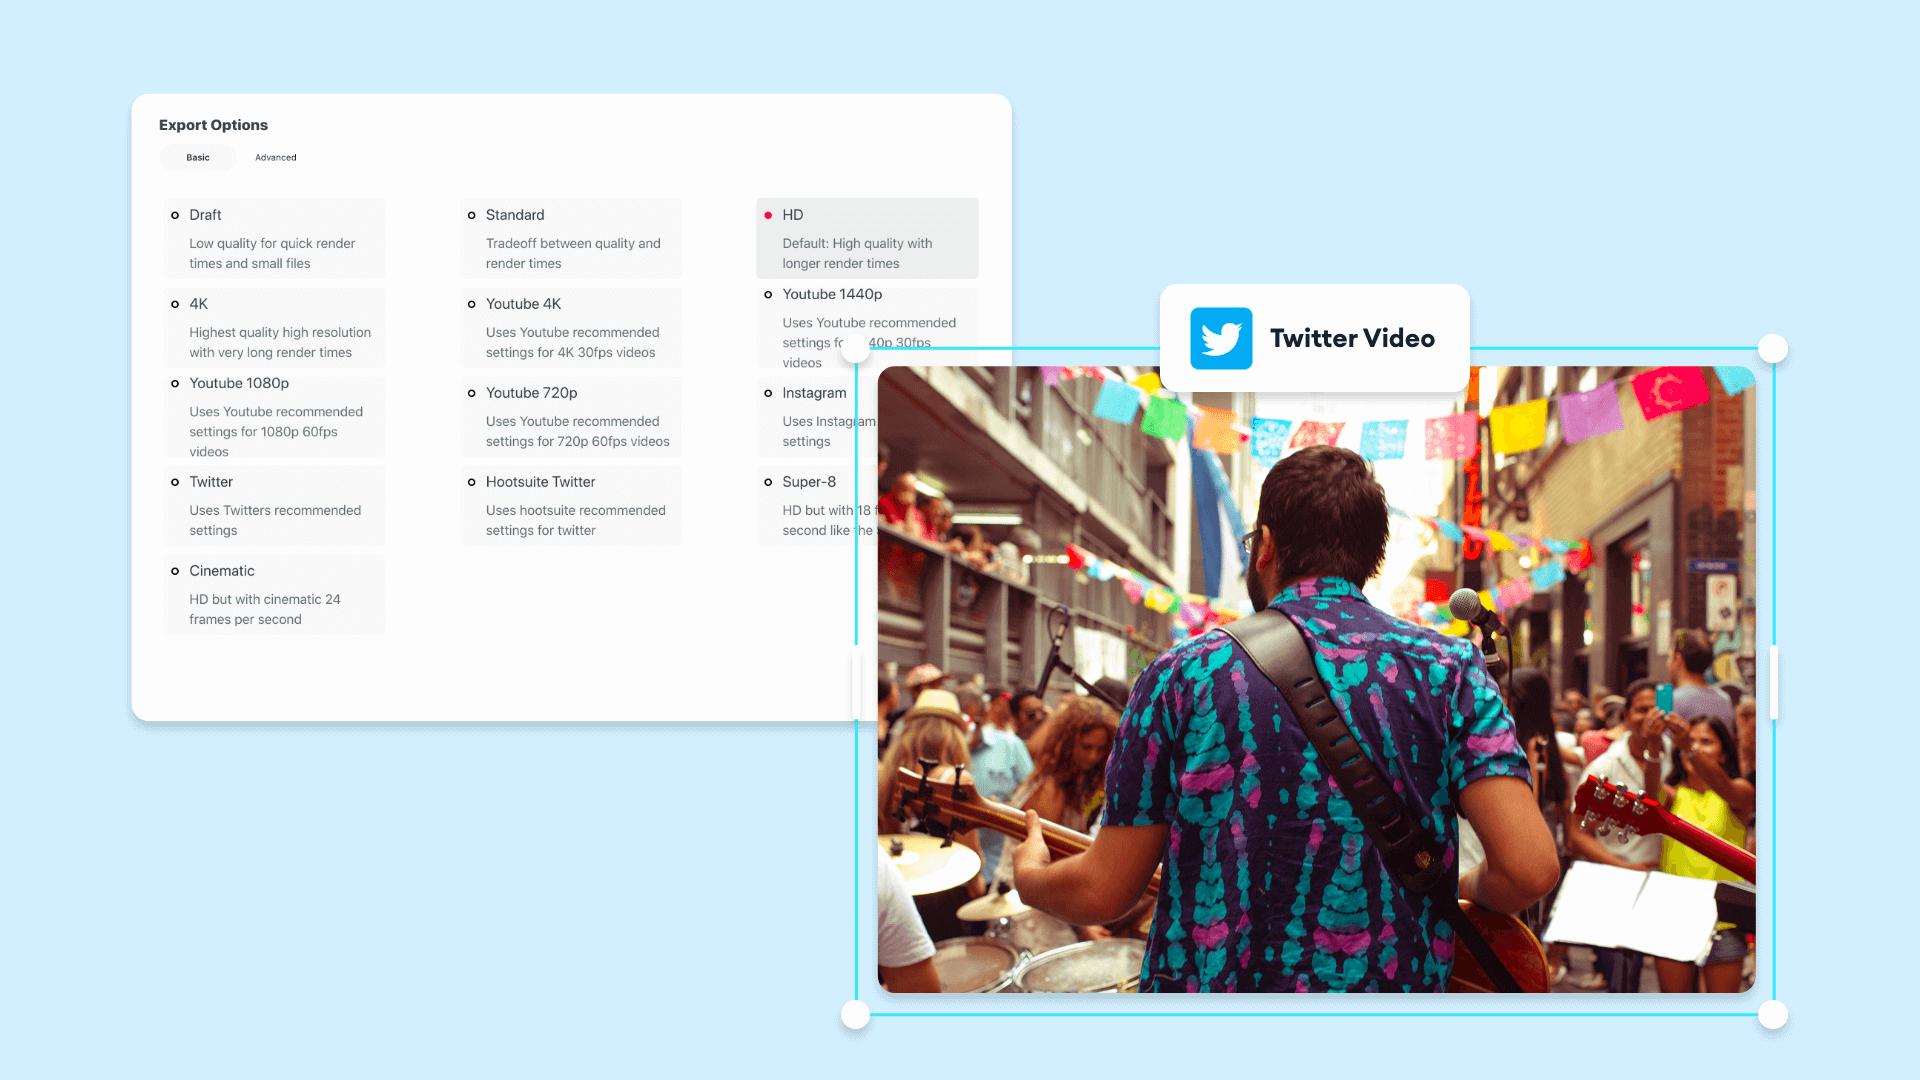 Twitter's Video Limit: Best Video Size, Length, & More [Cheat Sheet]